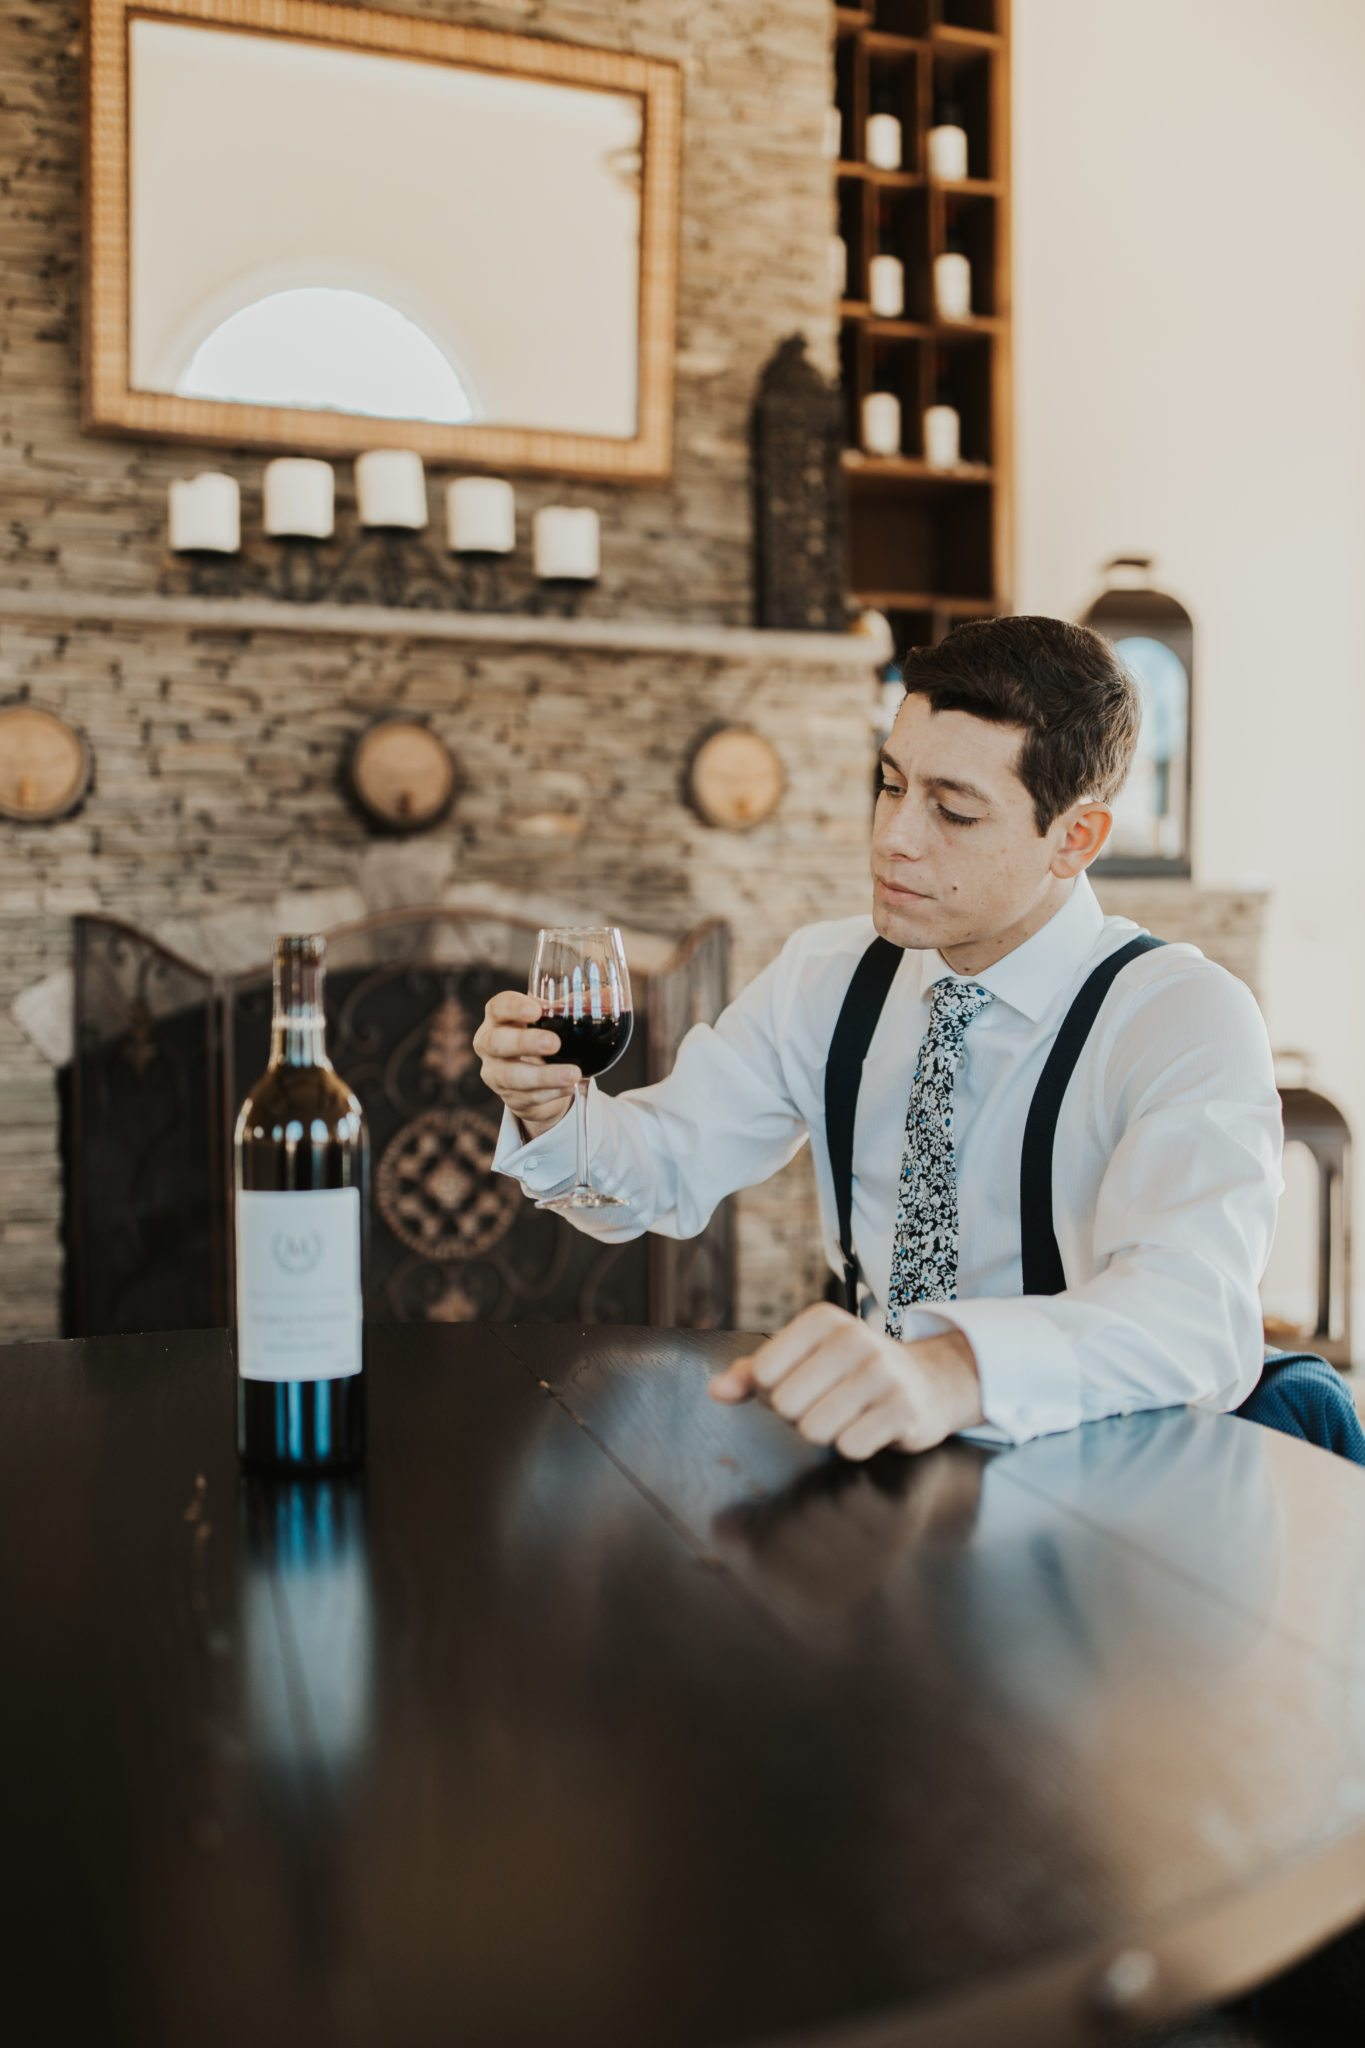 Morais-Vineyards-Wedding-Photographer-Brady-Bates-Photography-35 The Palacio Package